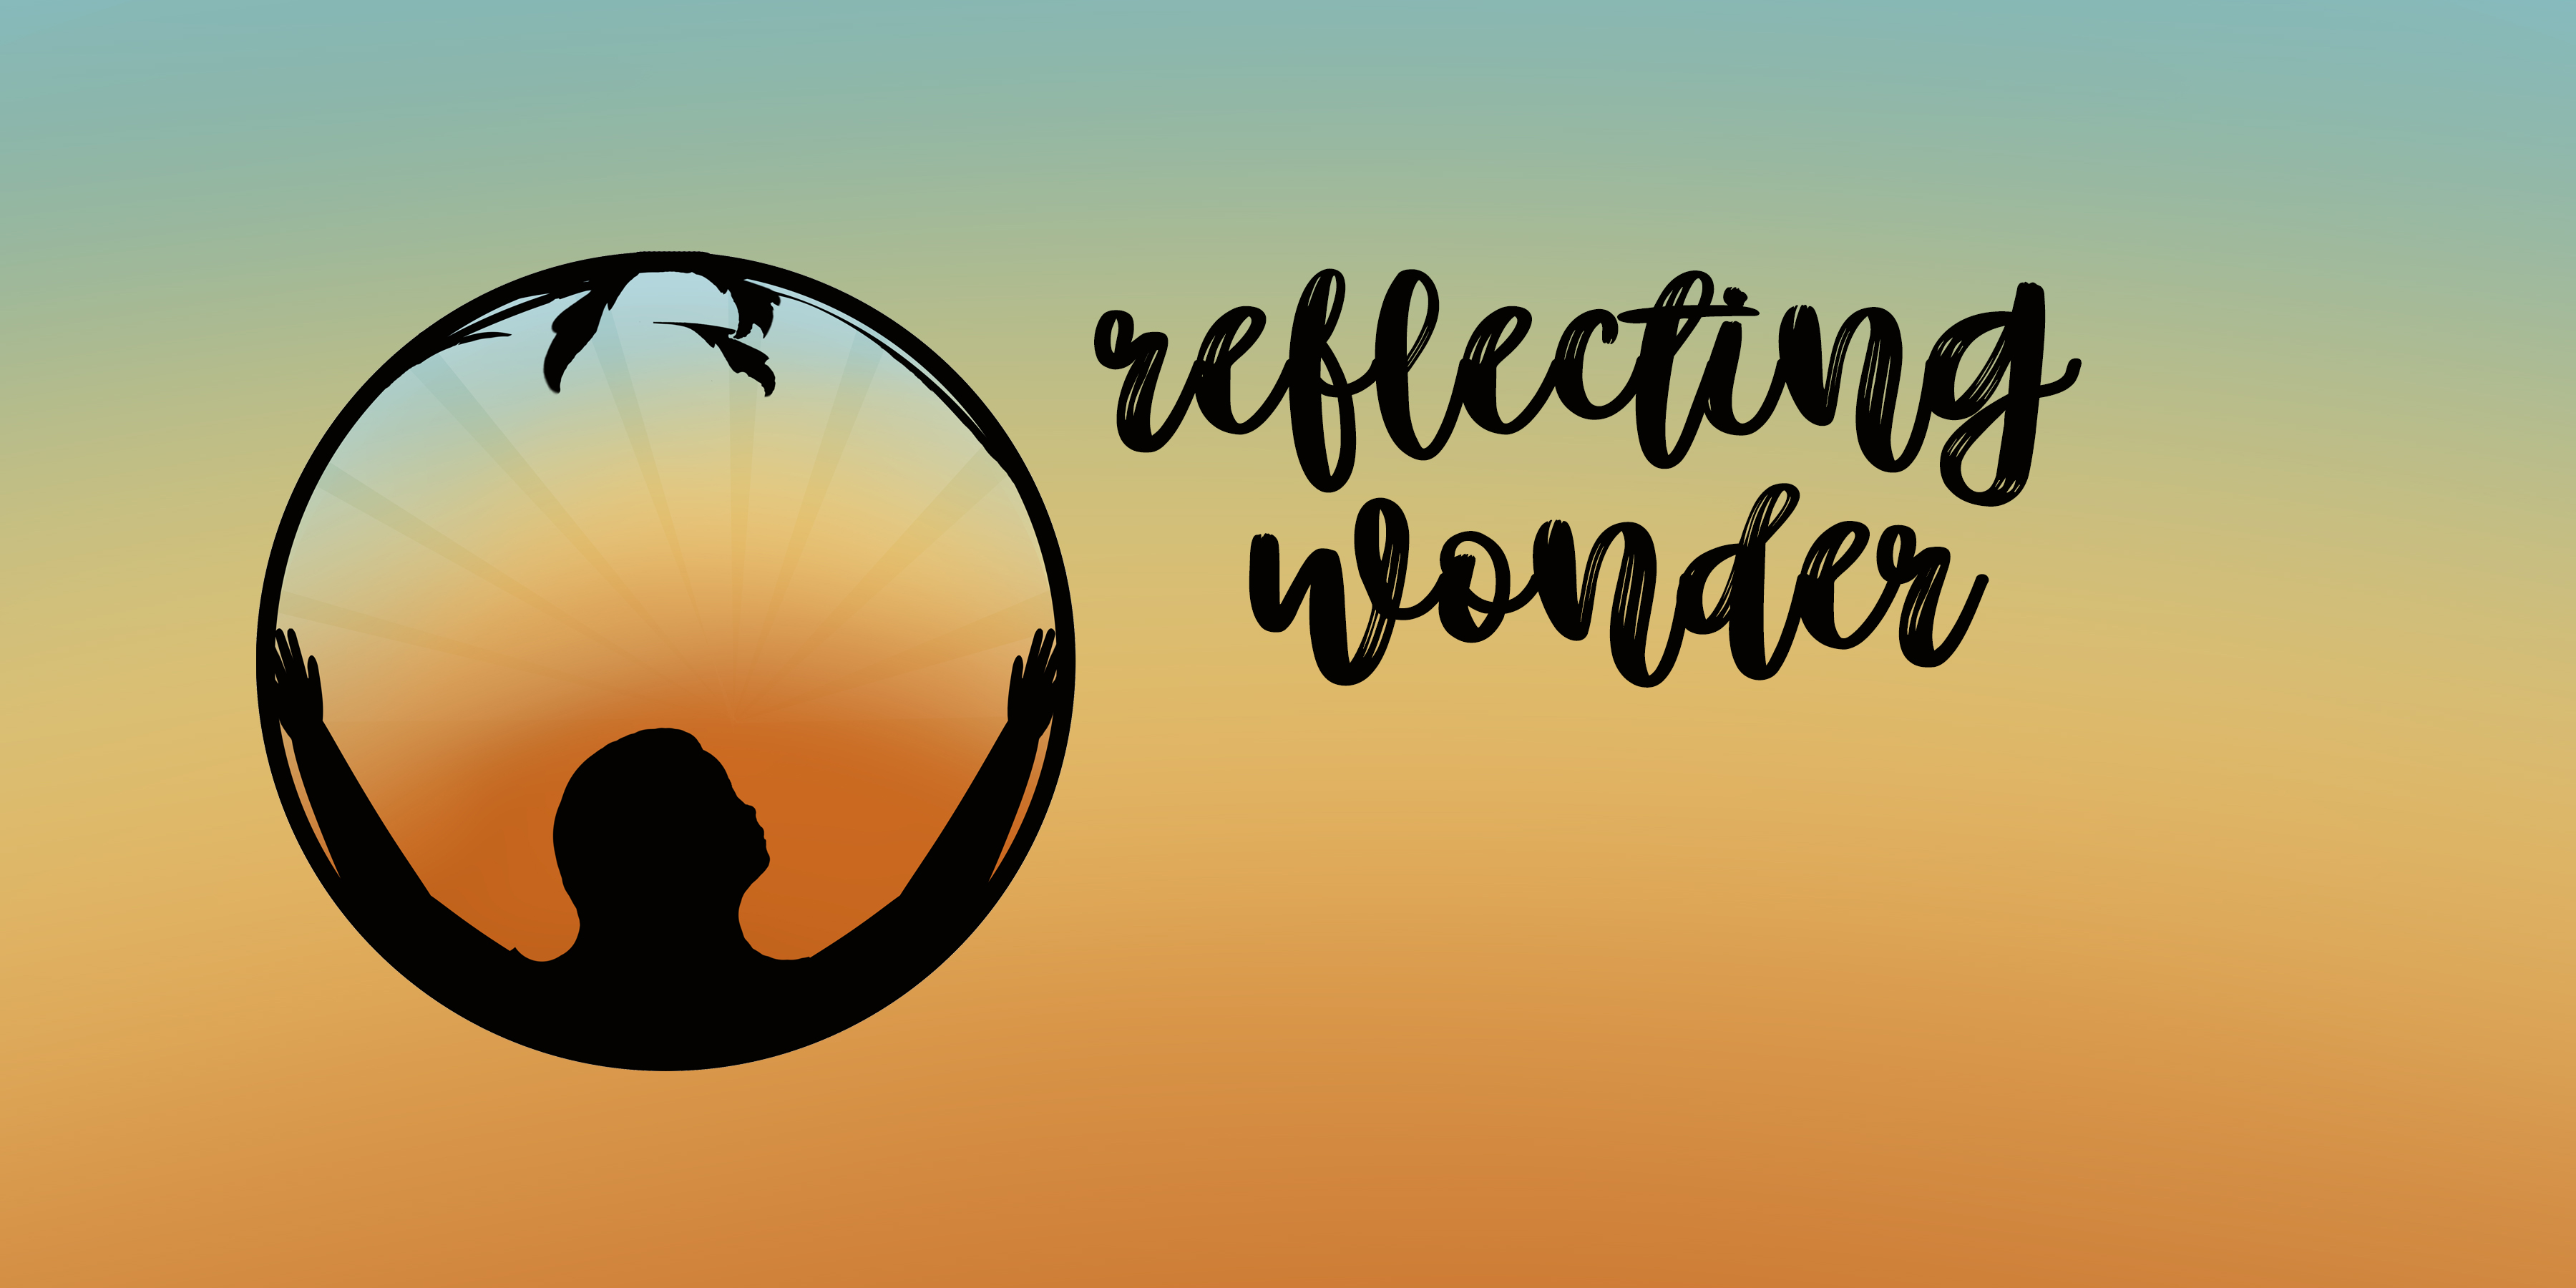 Unit 1 Week 1 – Reflecting Wonder